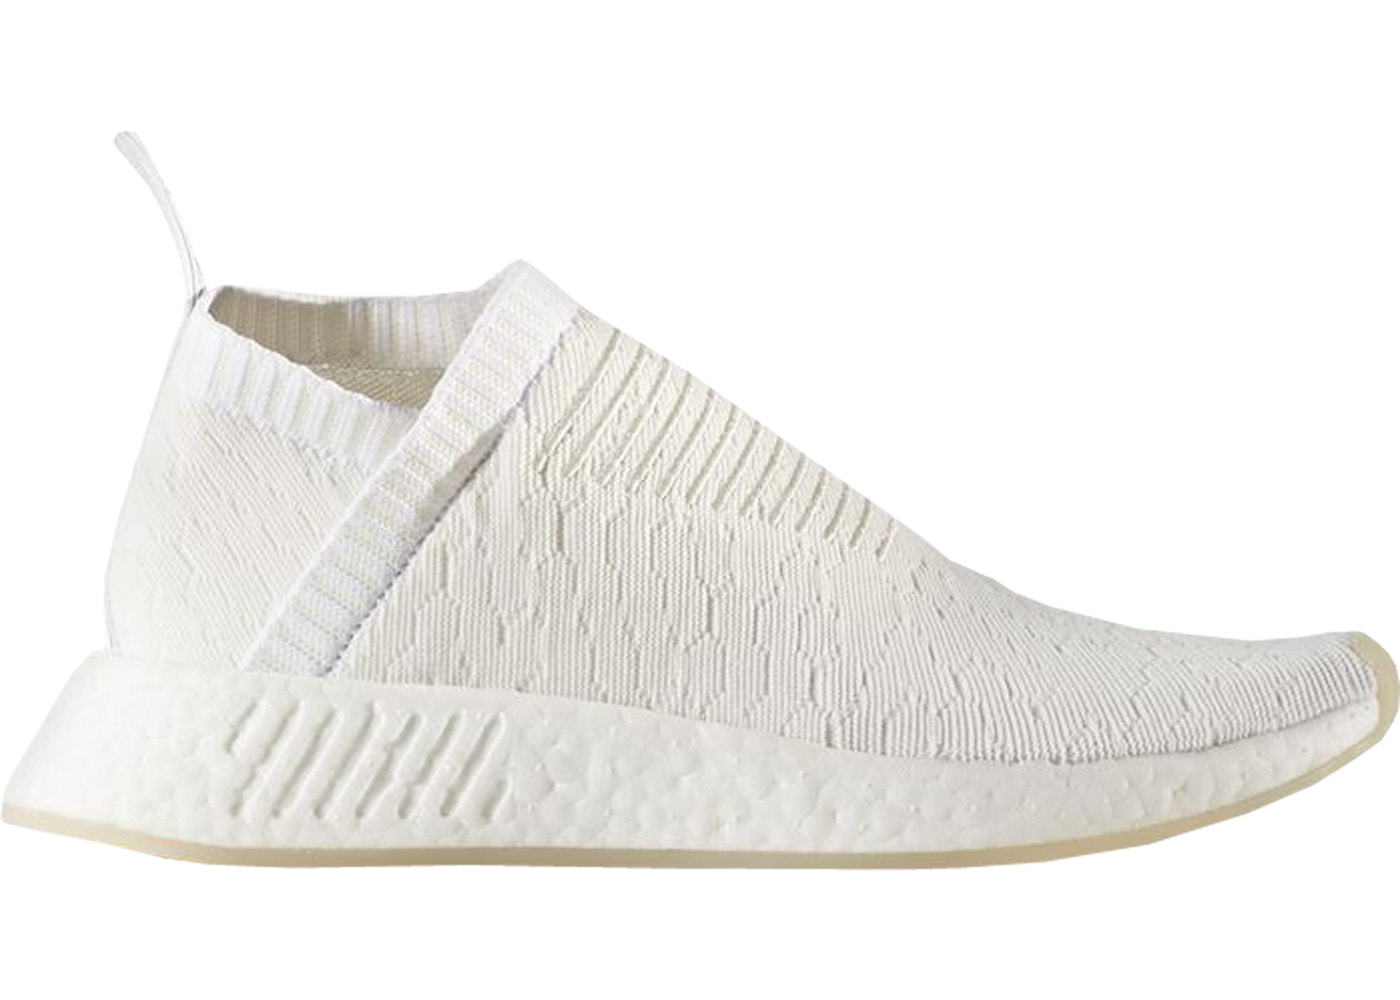 adidas NMD CS2 (W) Triple White